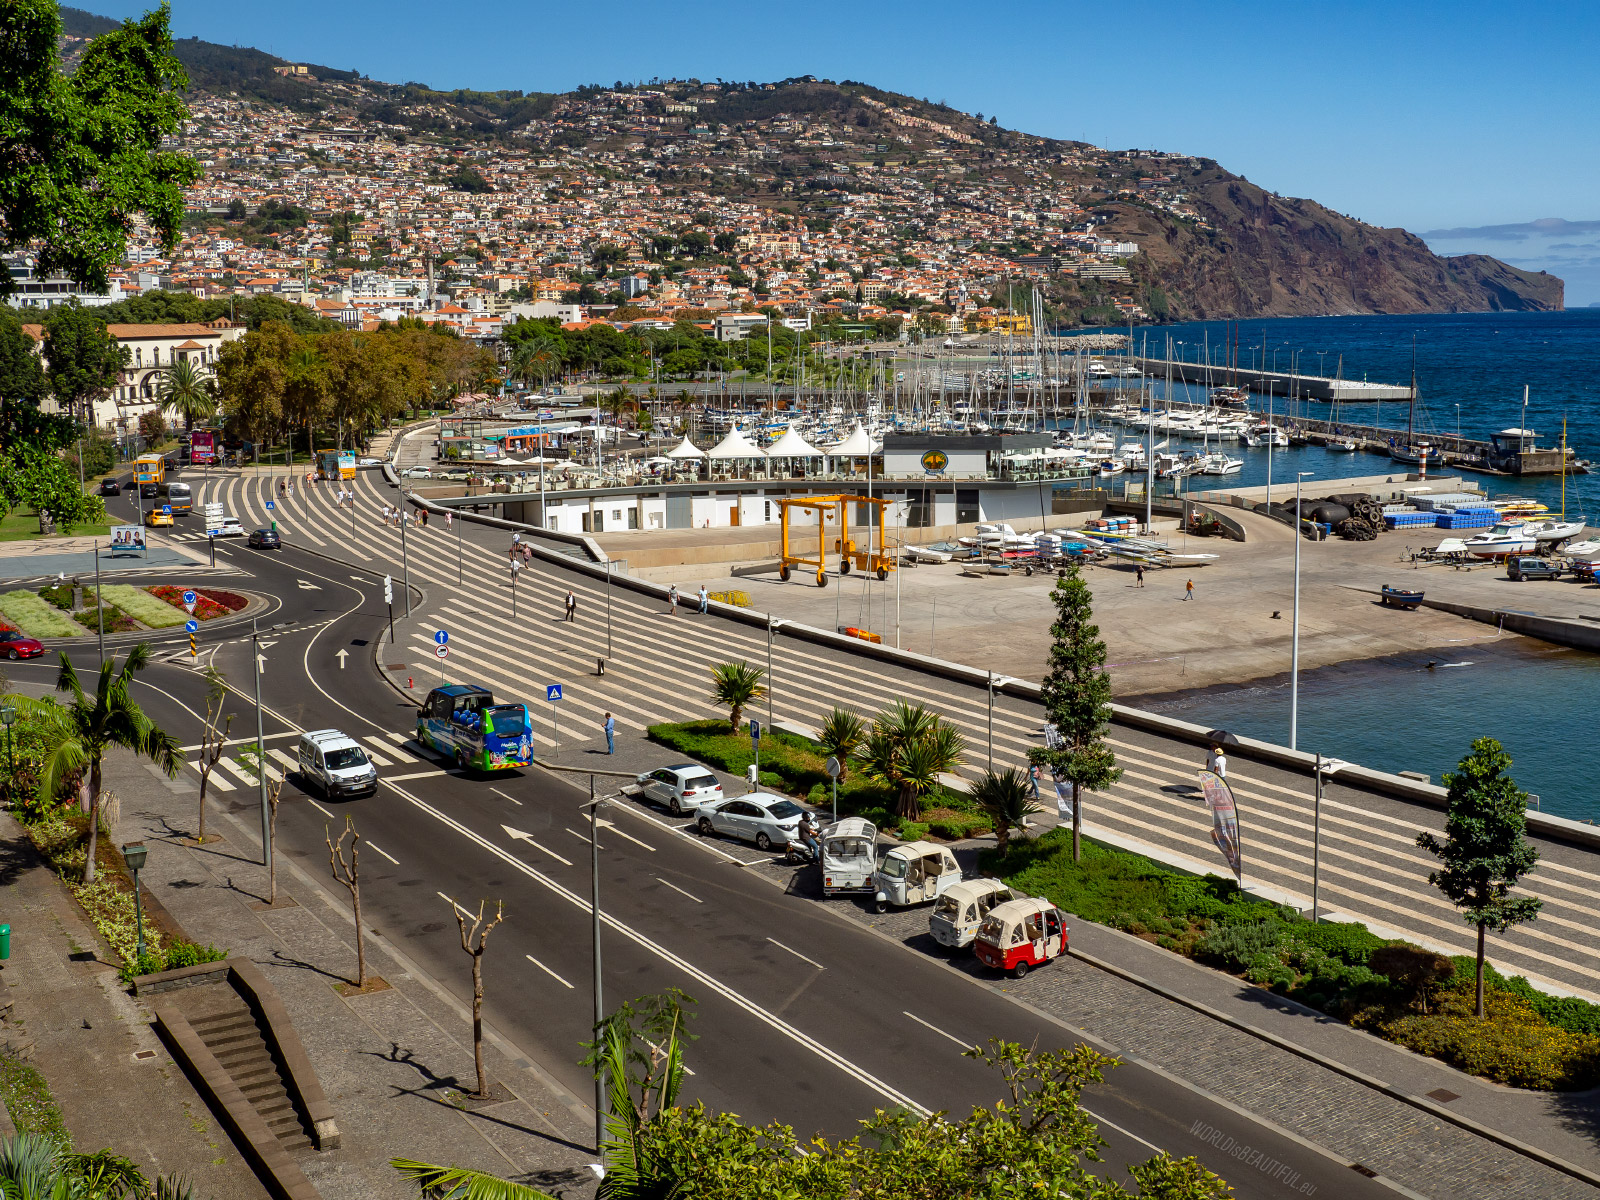 Port i Marina w Funchal